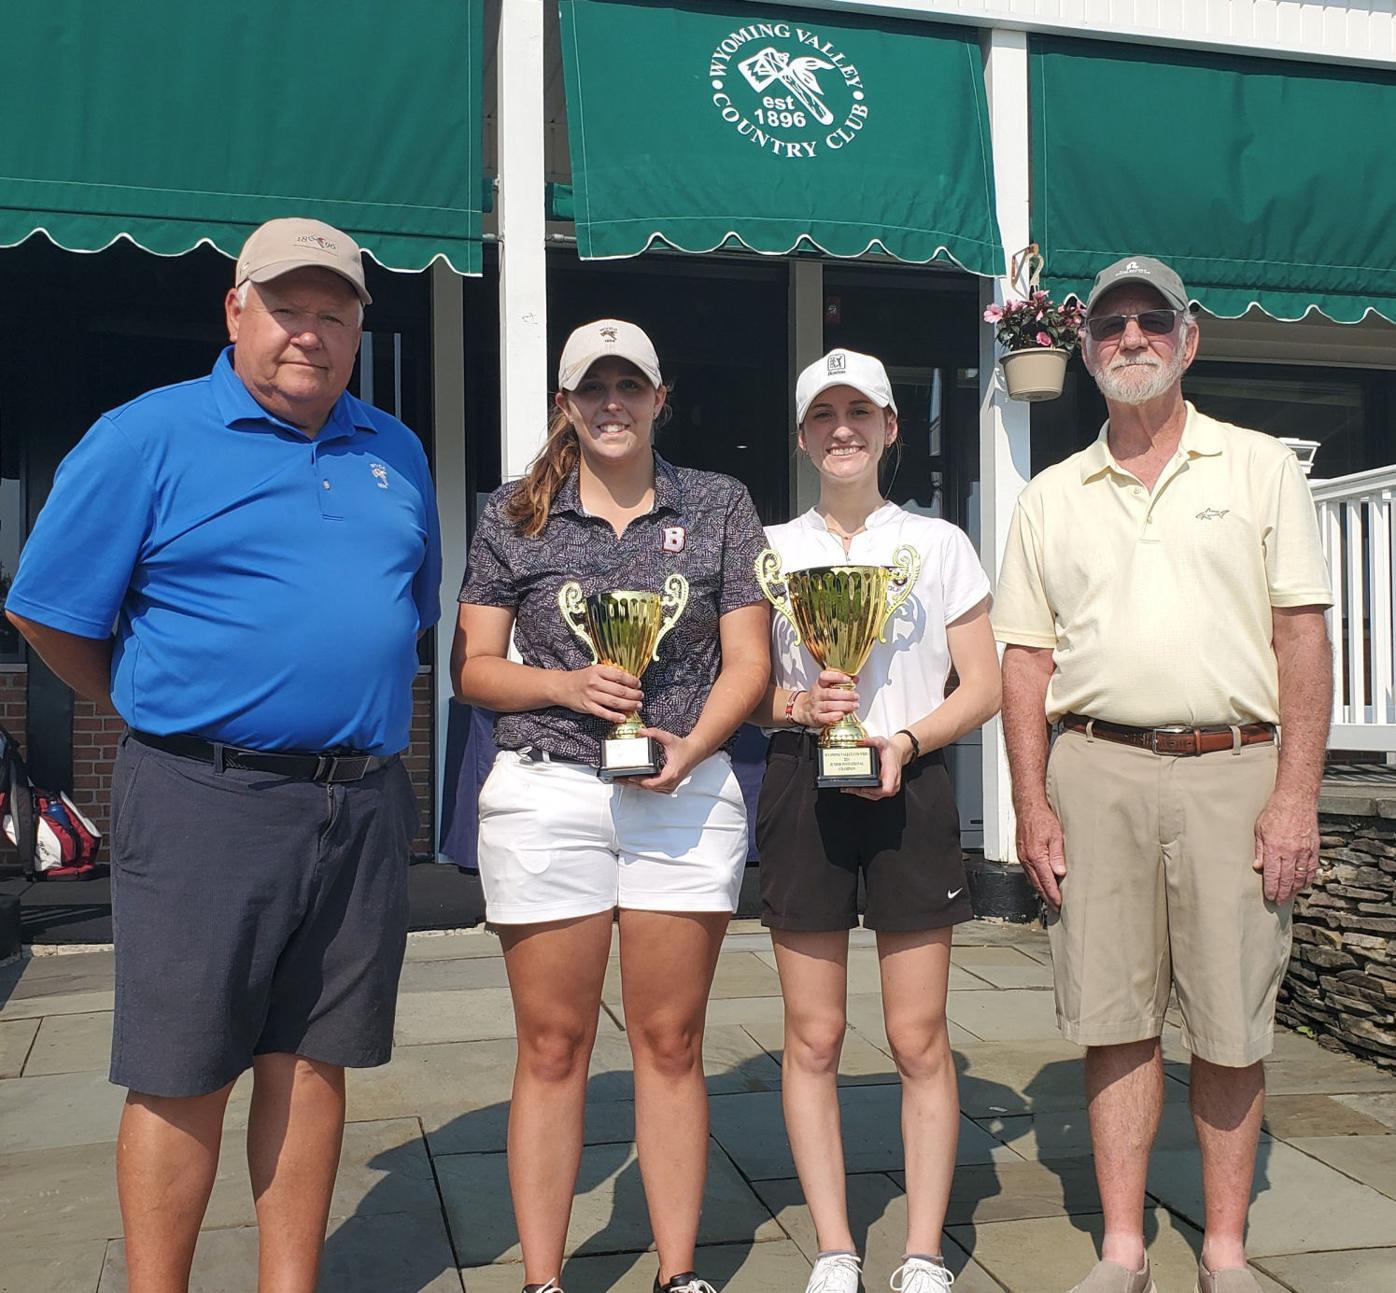 Local golfers shine at WVCC Junior Invitational